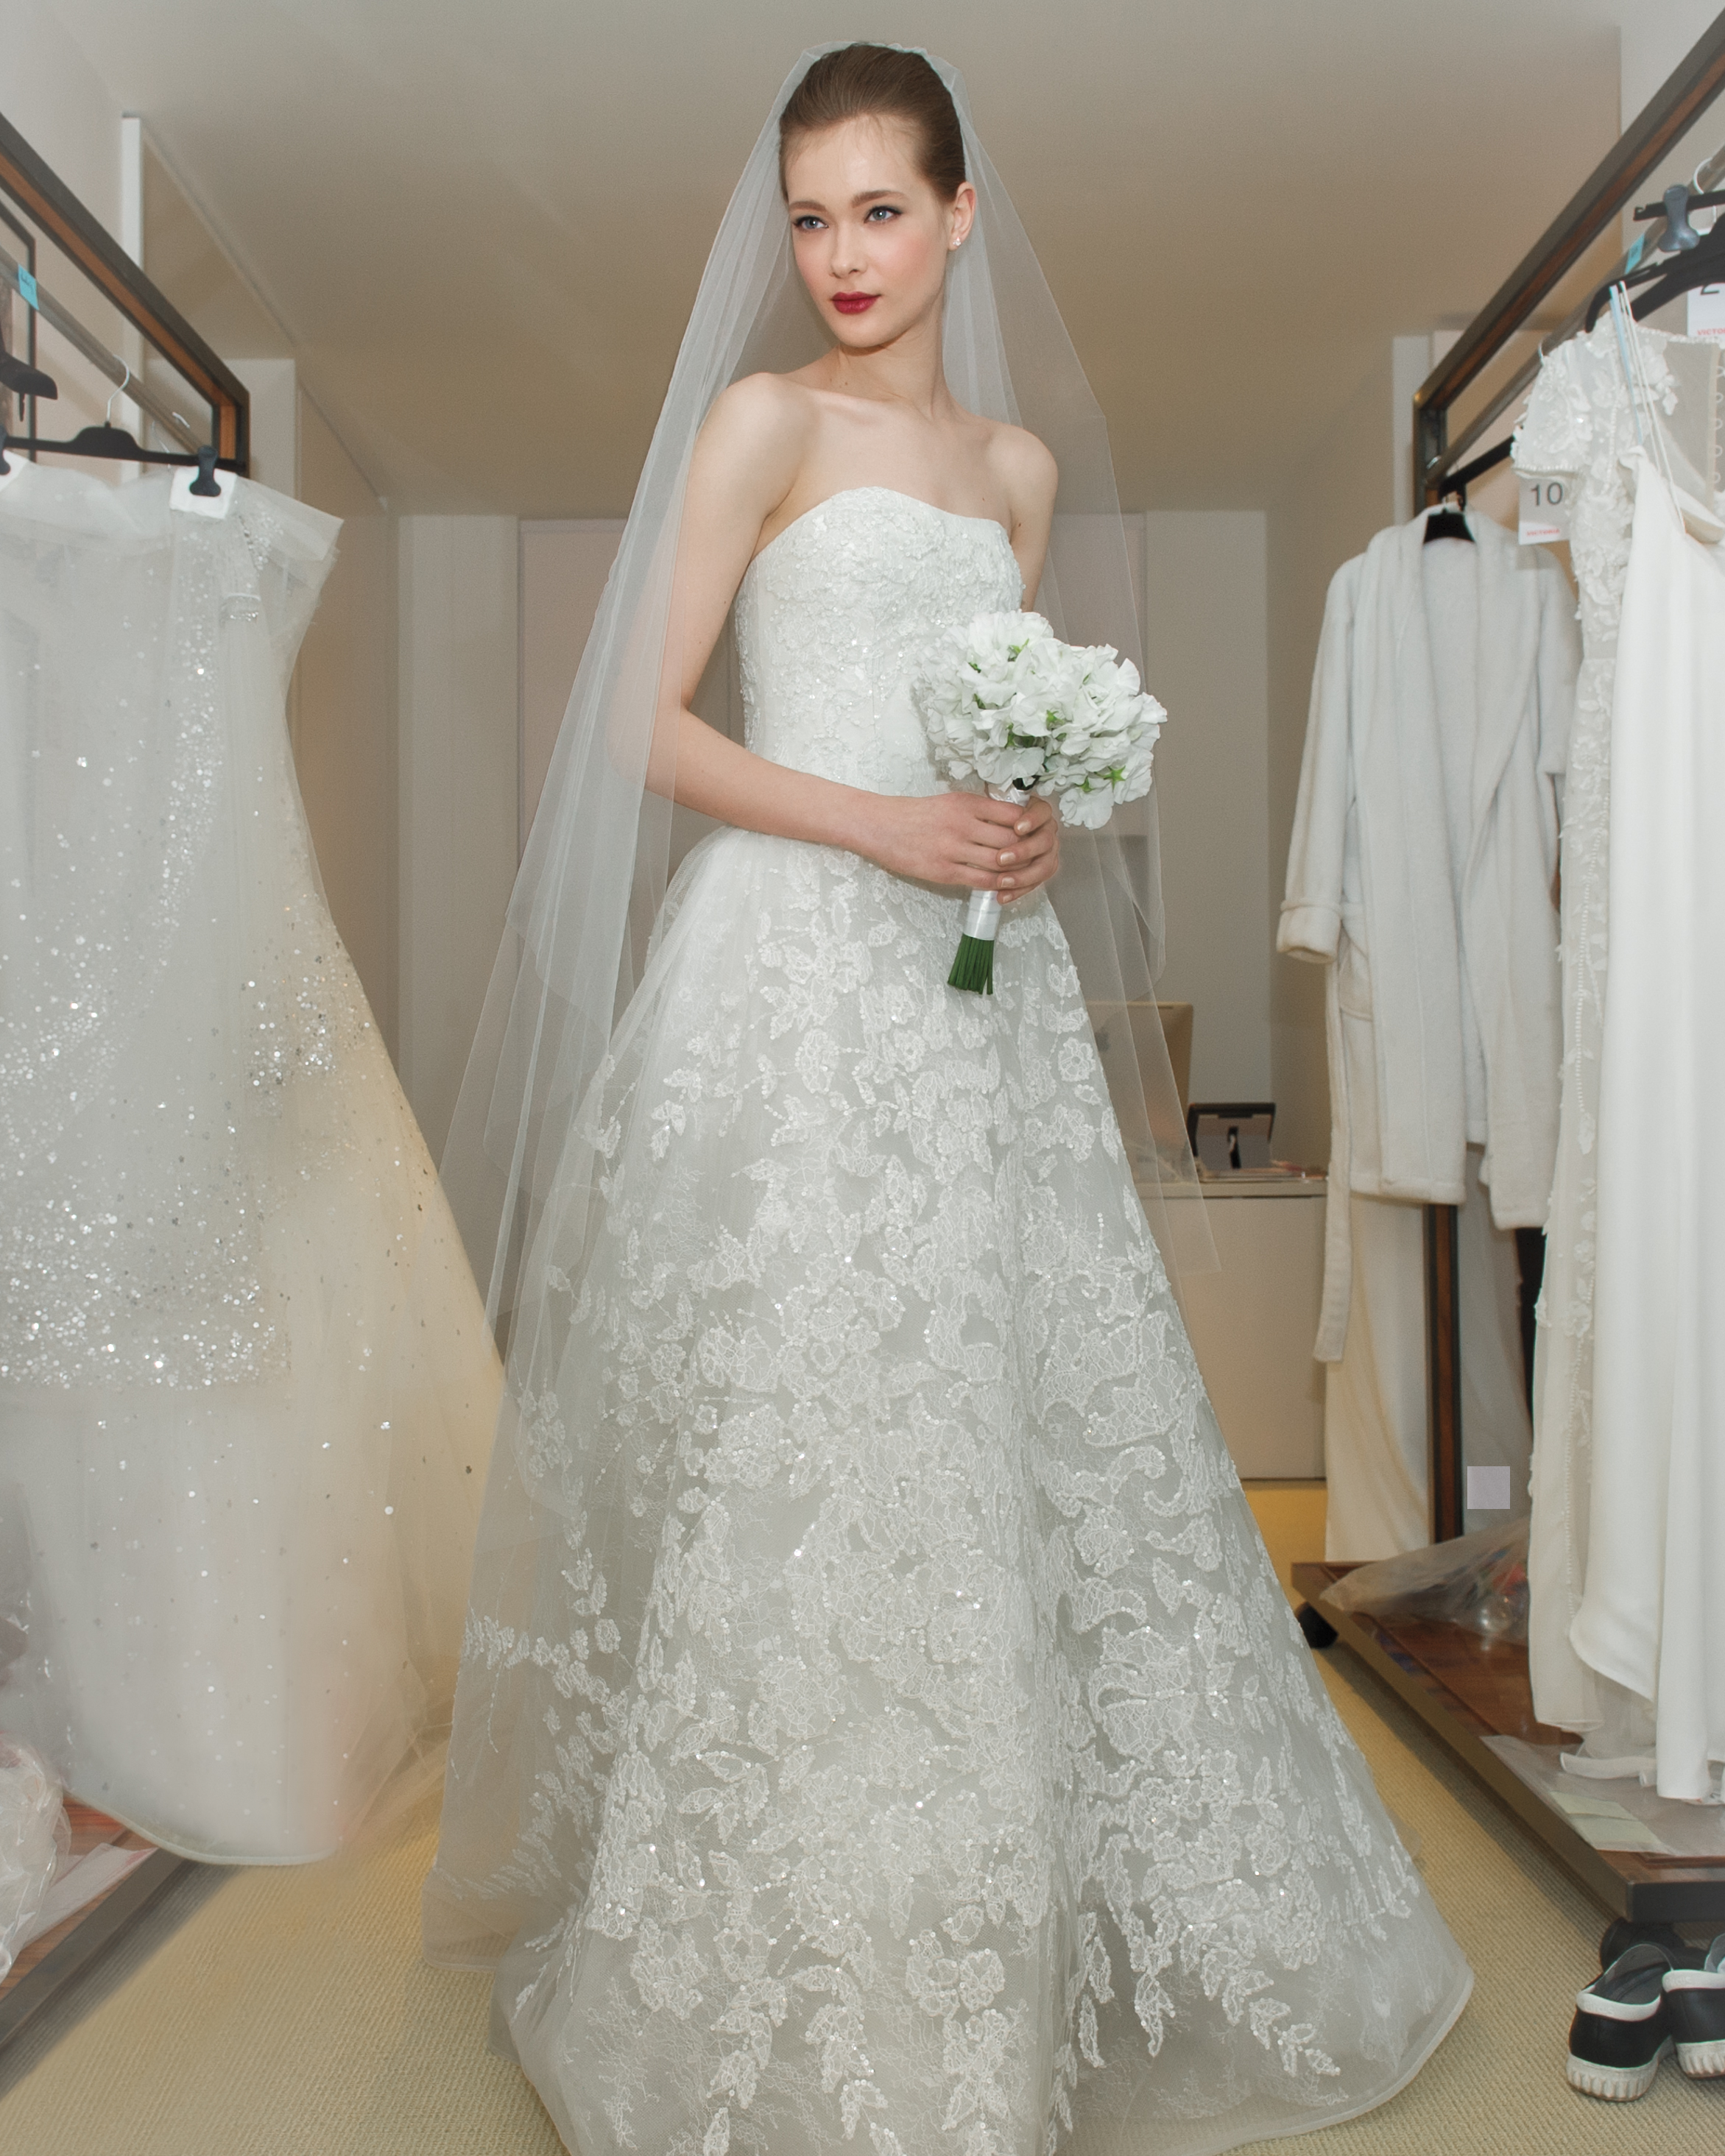 herrera-backstage-bridal-market-mrc-d111212-70-edit-r.jpg